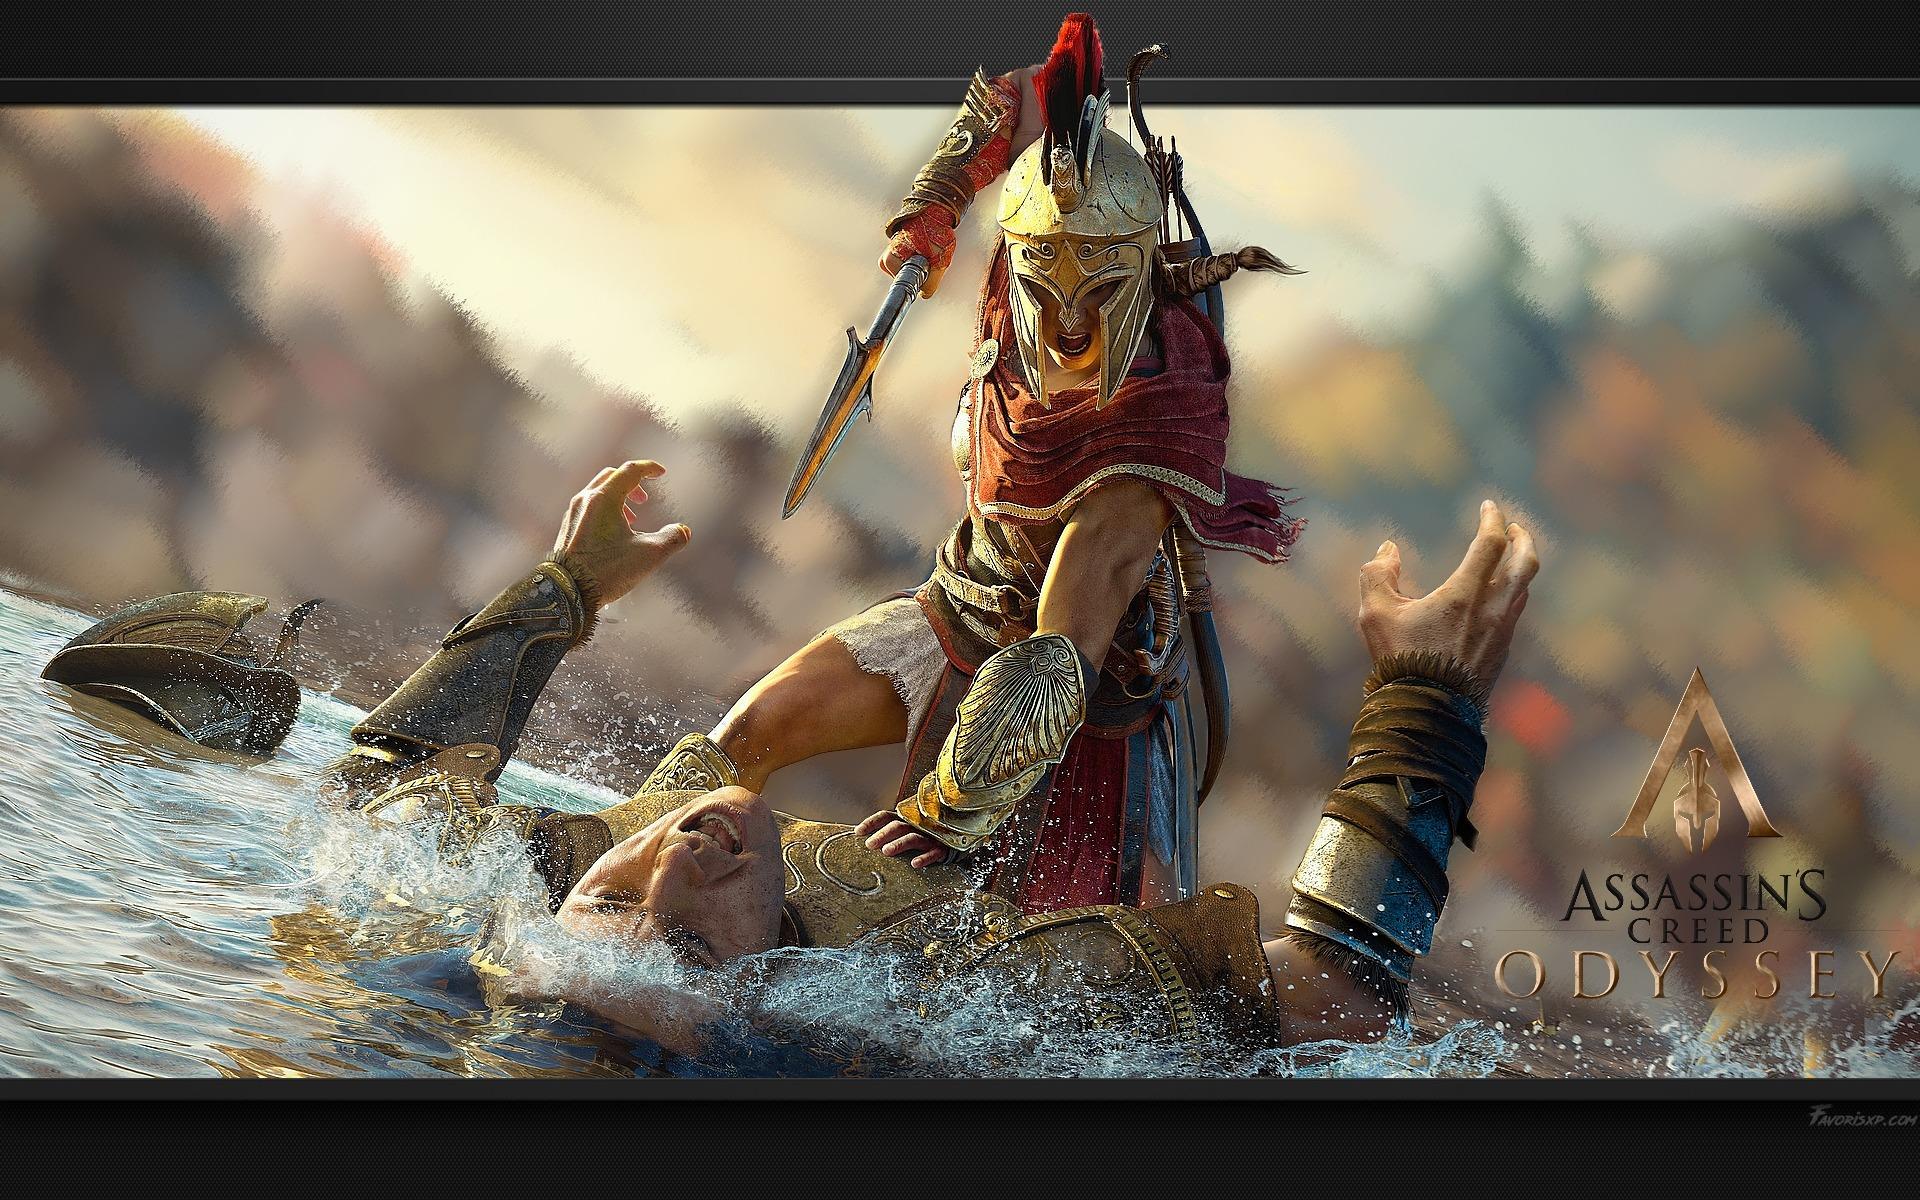 Ac Assassin S Creed Fonds D Ecran Odyssey Image Arriere Plan